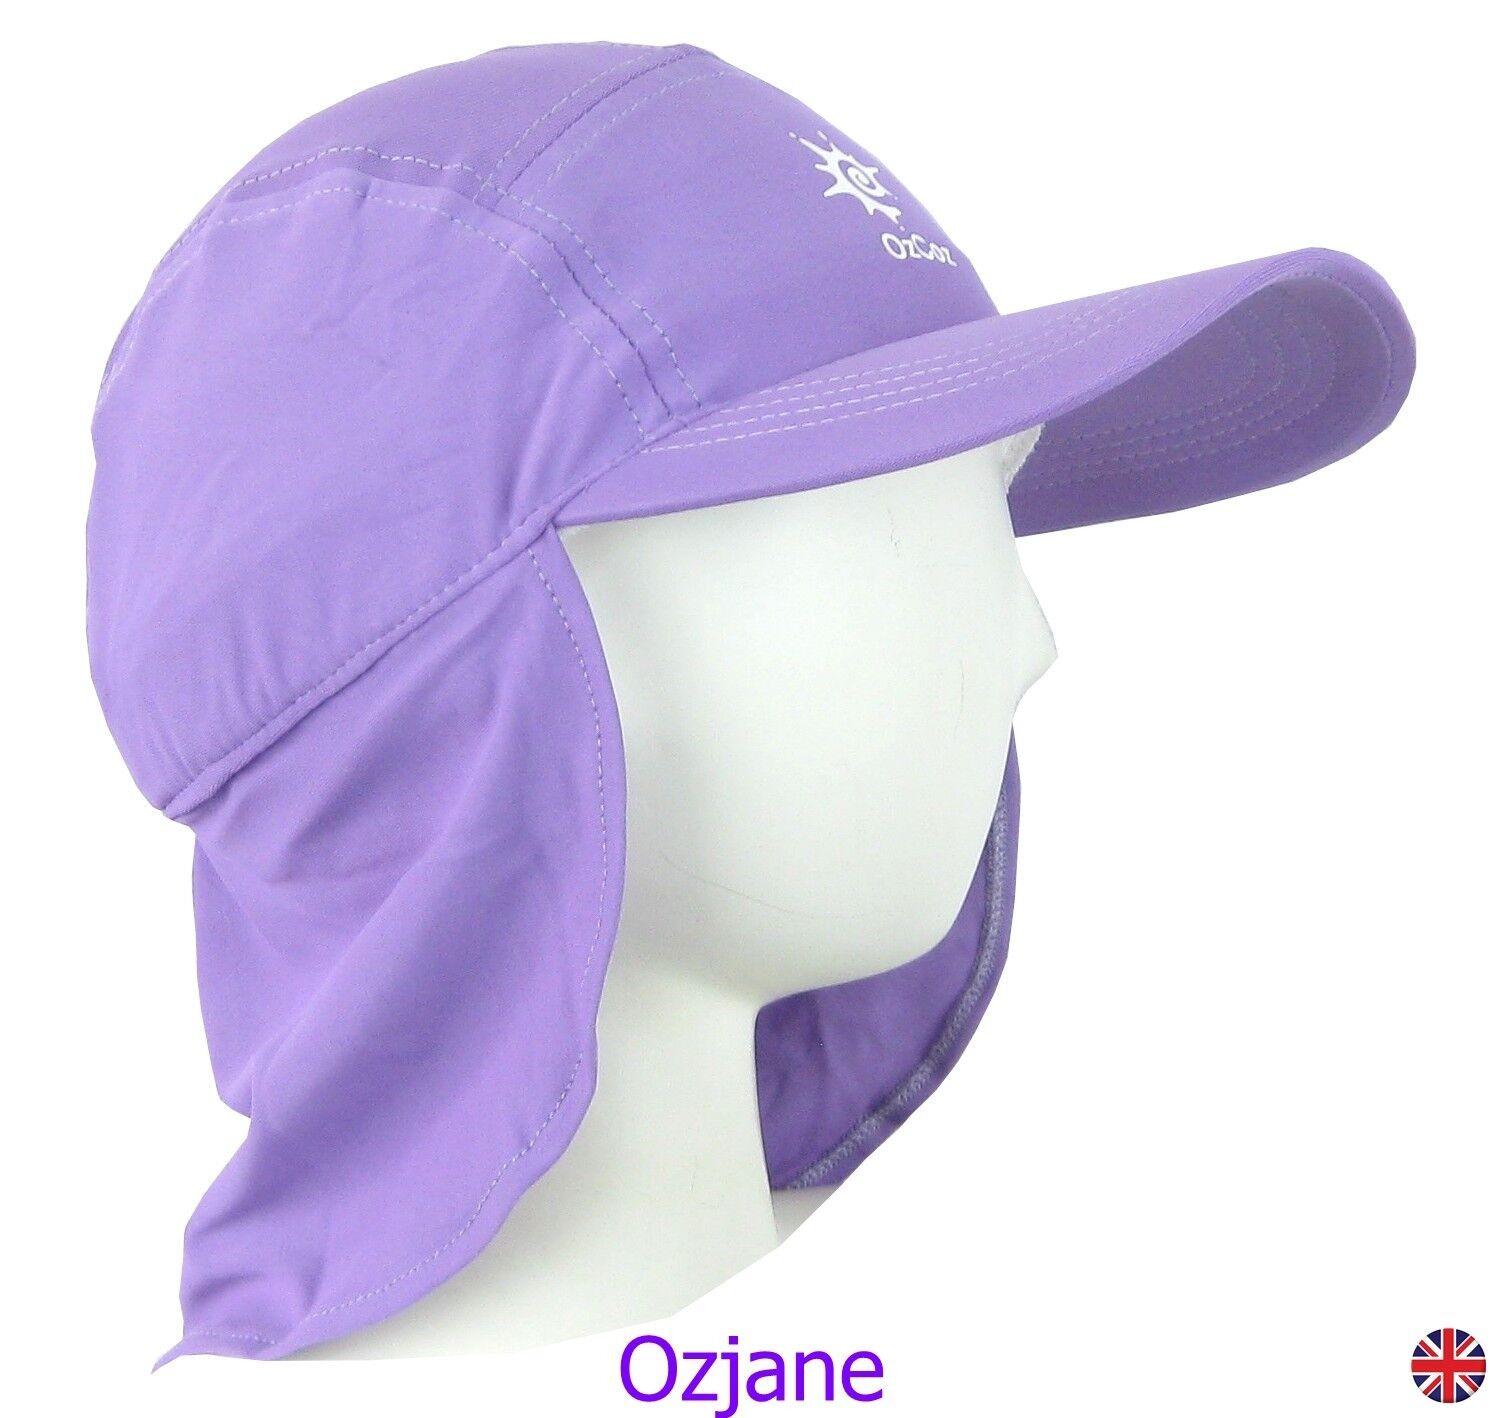 OZCOZ SUN SWIM HAT SUN PROTECTION LEGIONNAIRE PINK 11 TO 14 YRS GIRLS UV 50